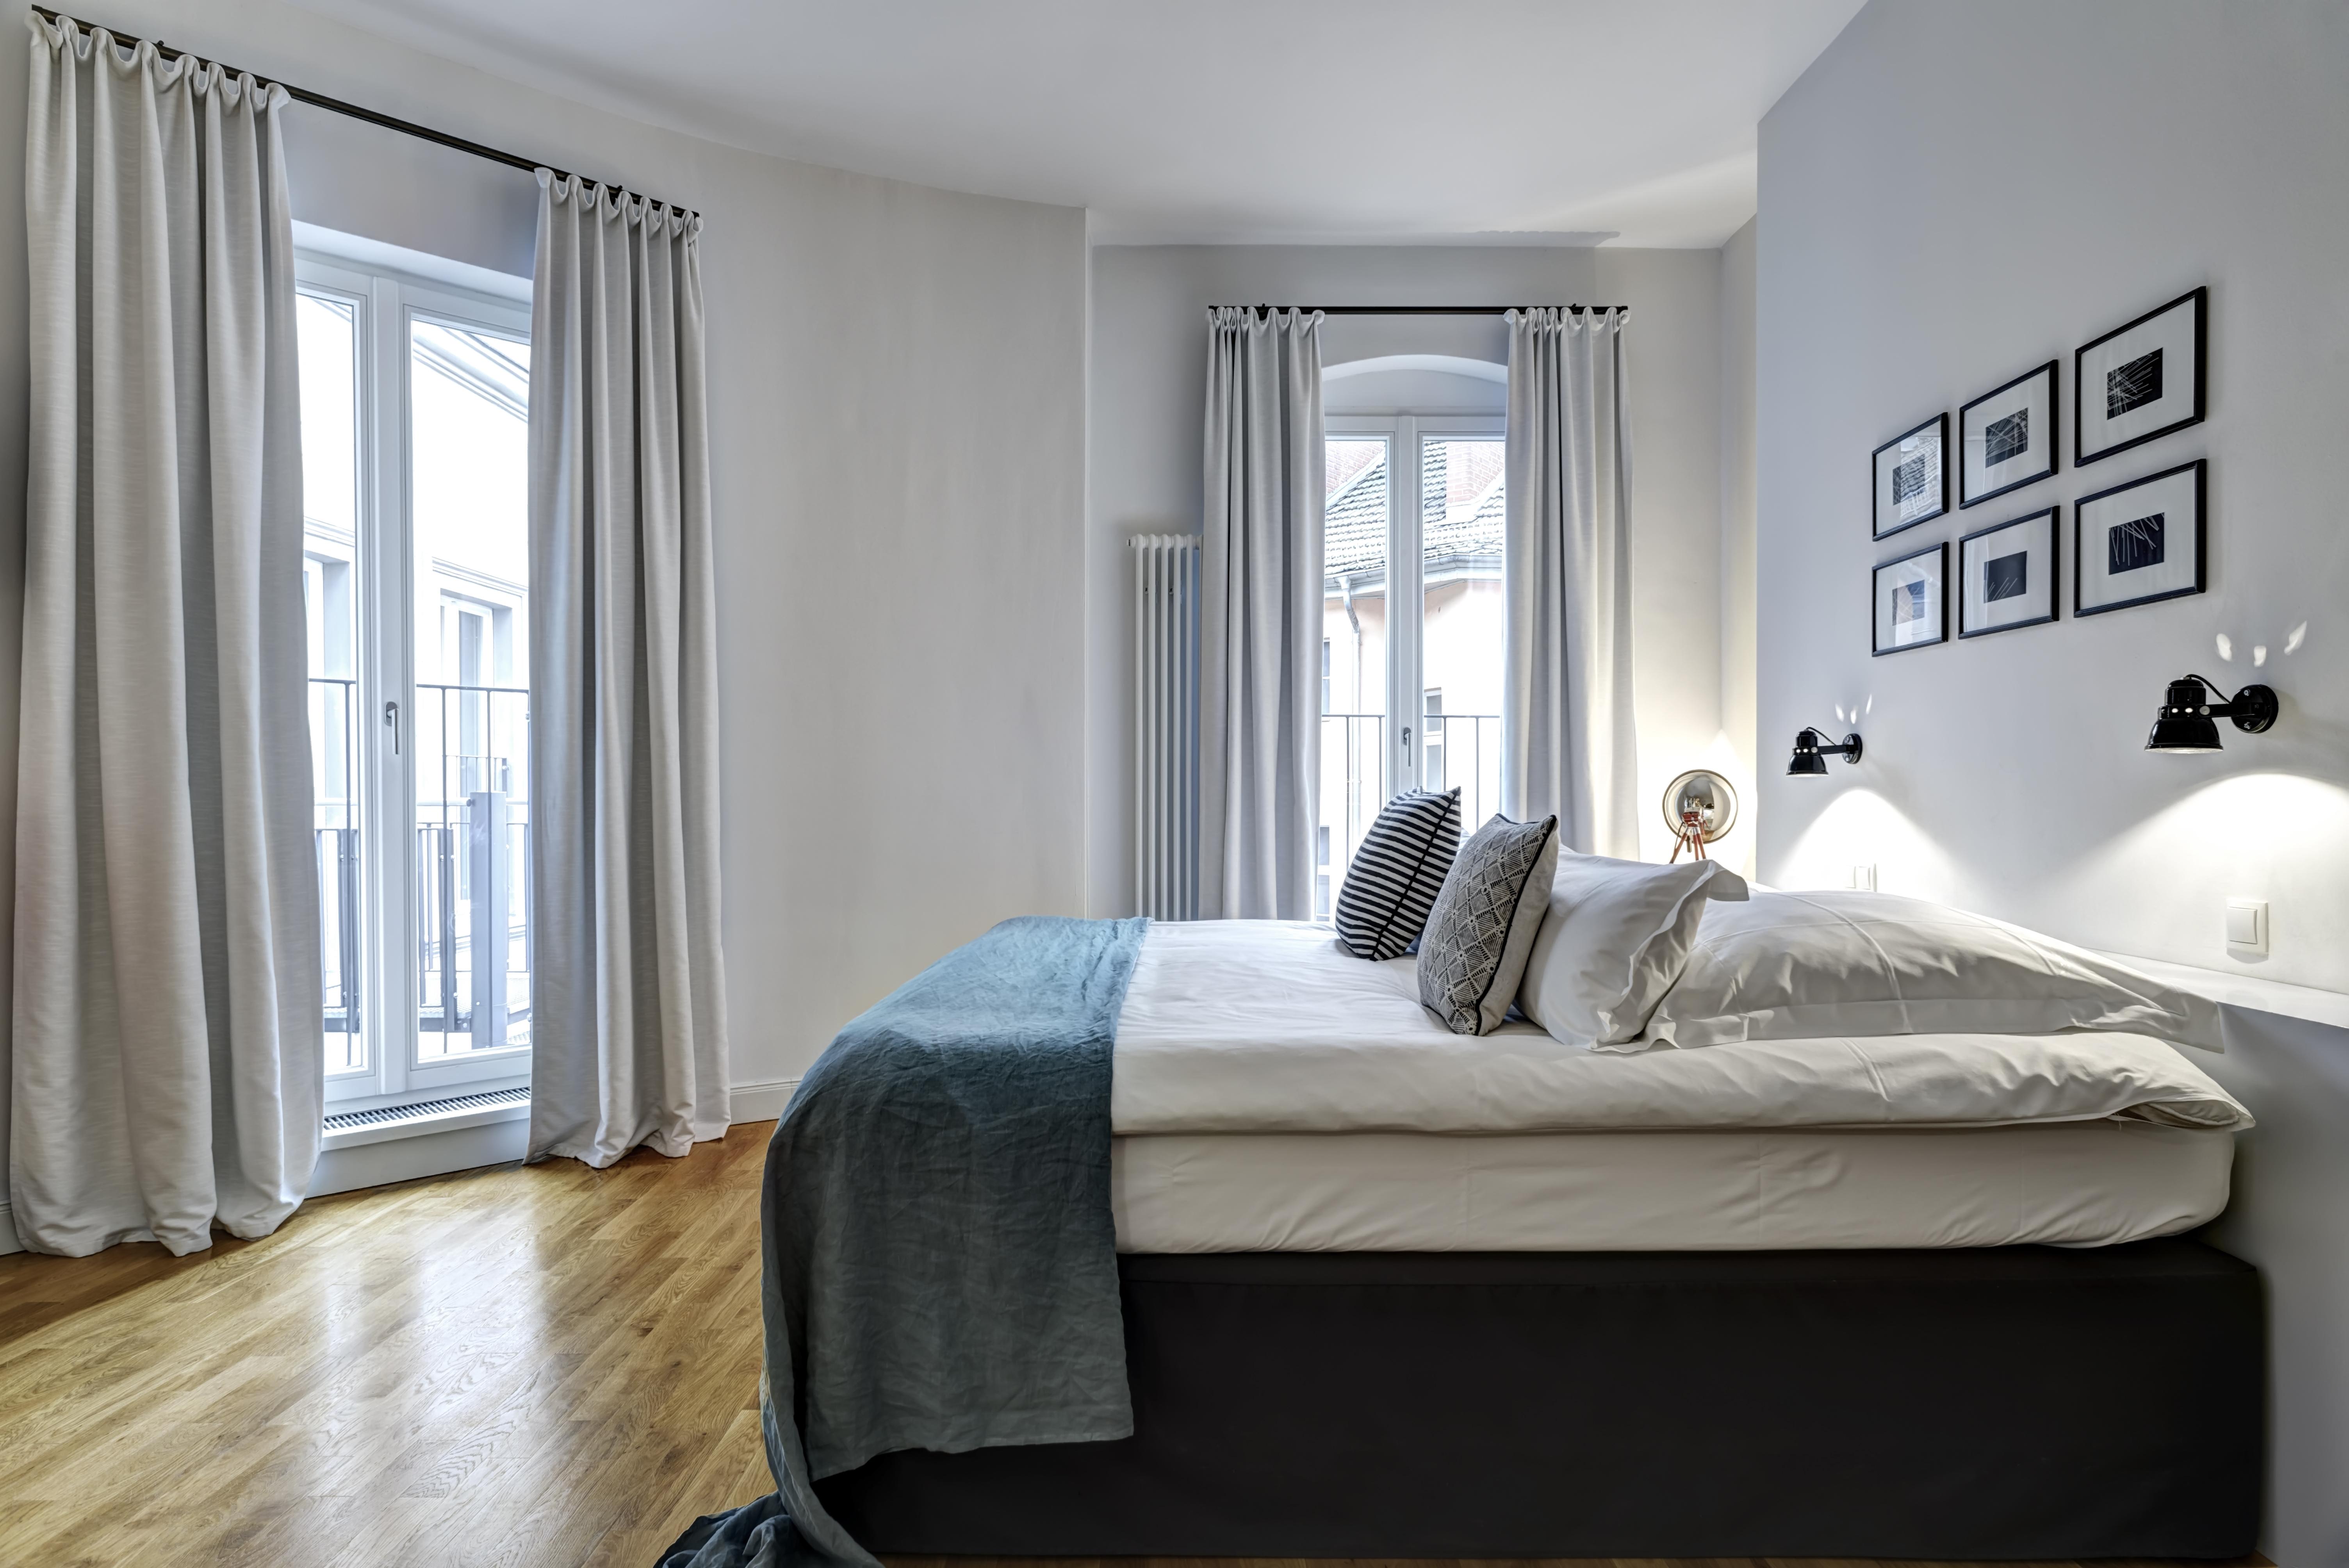 berlin city break 2 days in the stylish gorki apartments only 534 kr. Black Bedroom Furniture Sets. Home Design Ideas